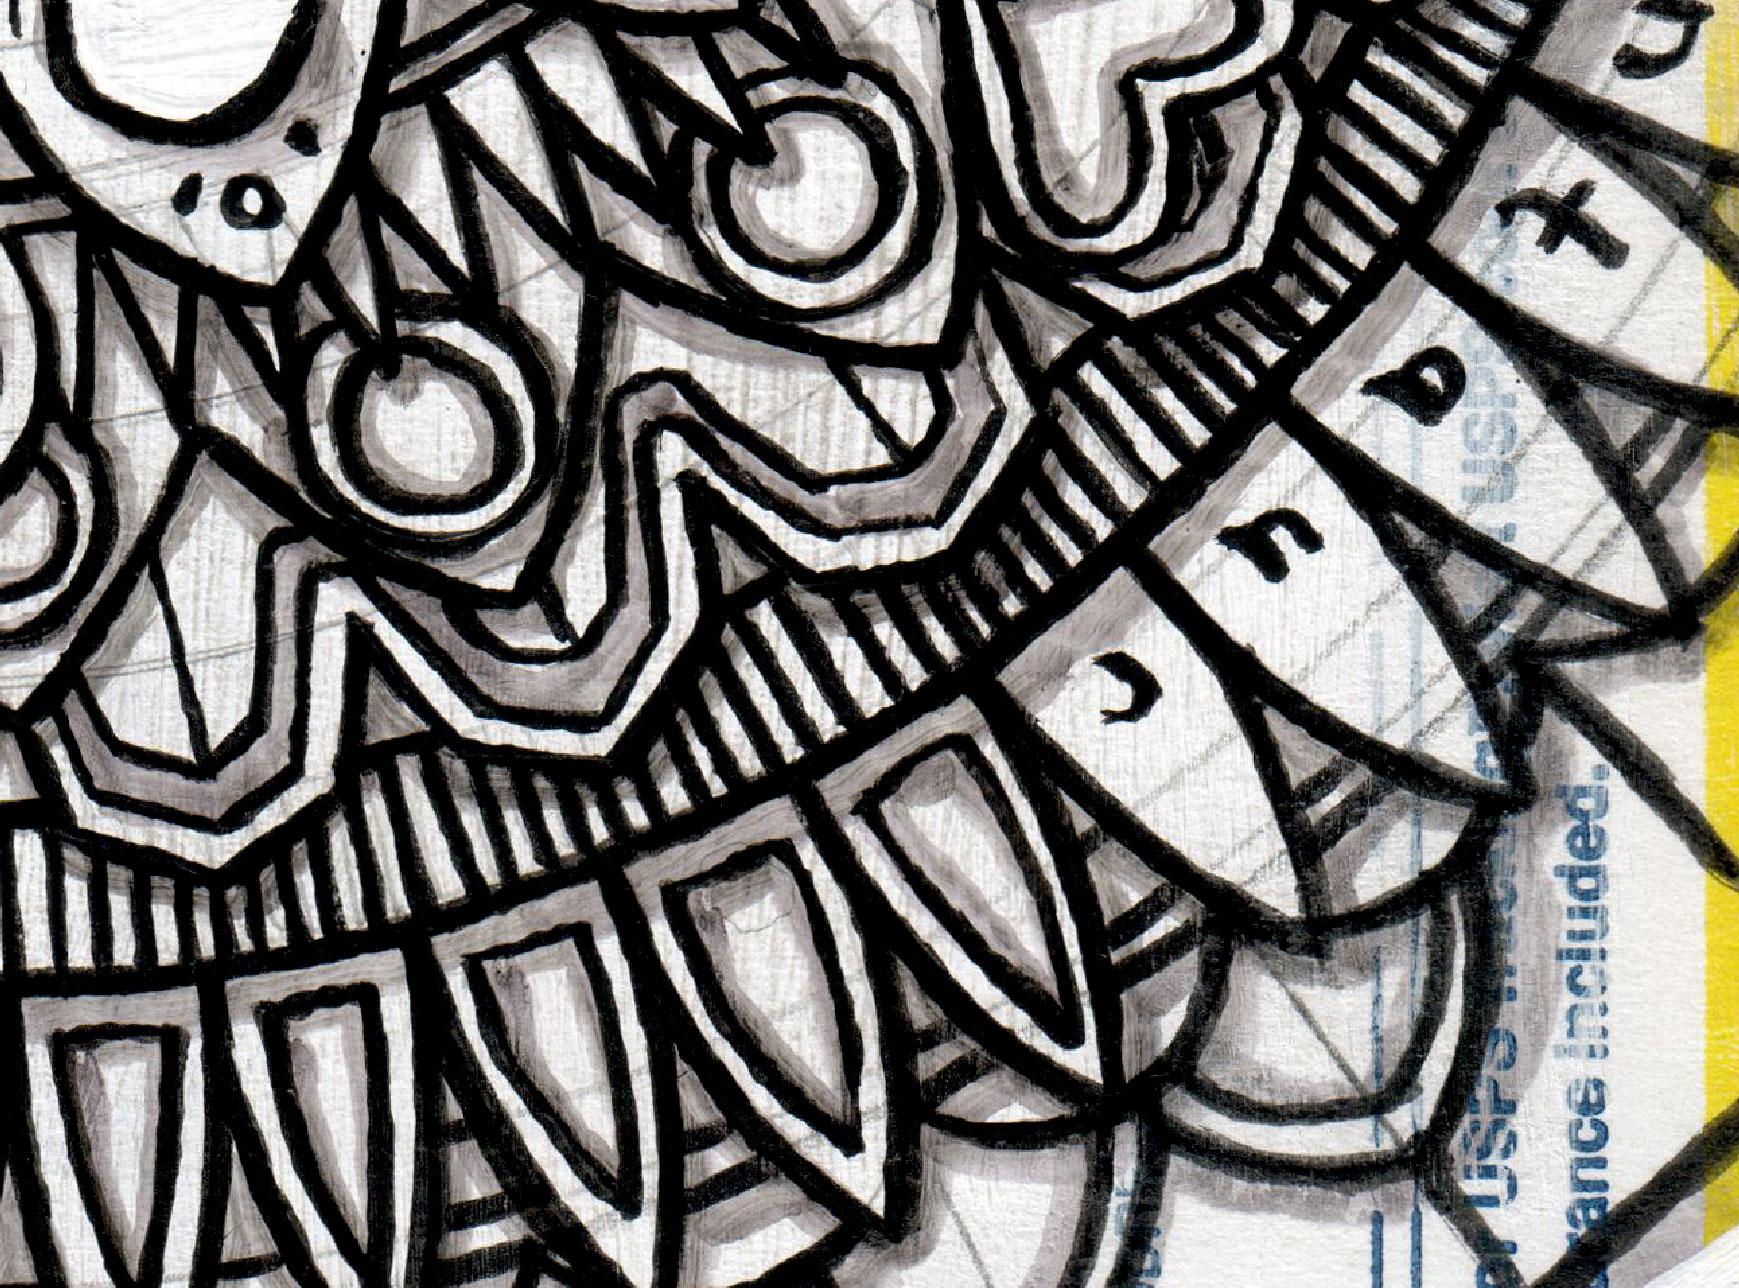 Pittacium-Painting_Detail3.jpg